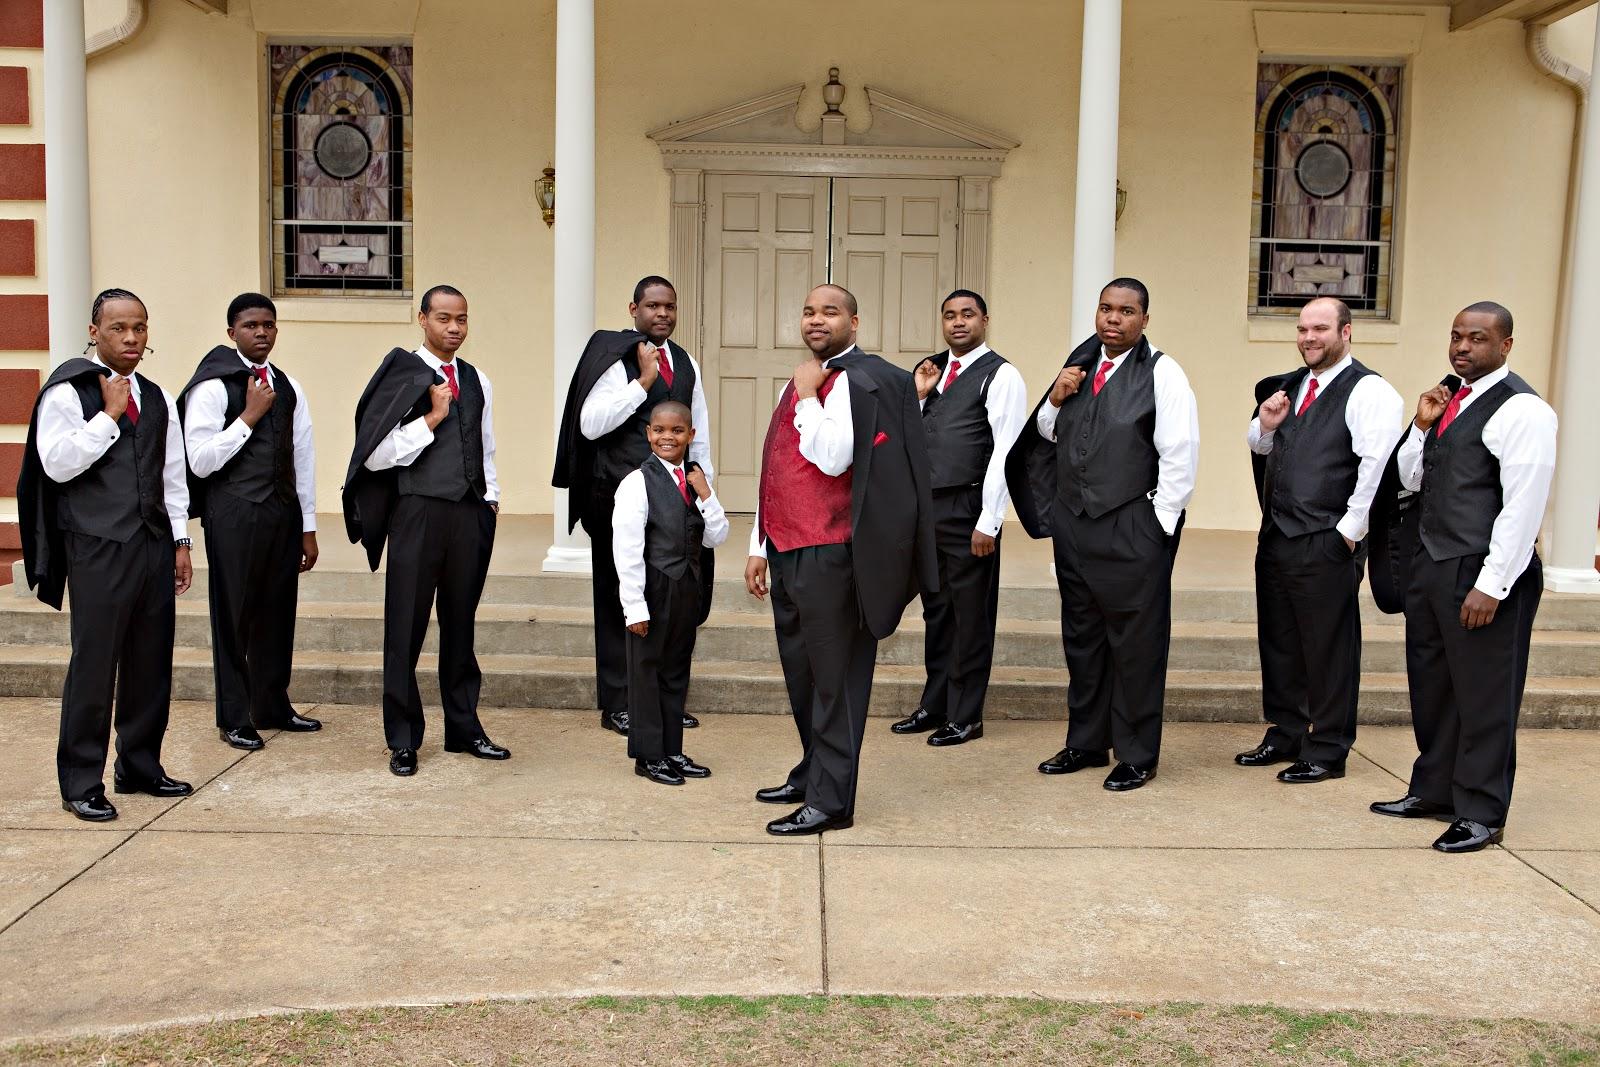 Groomsmen with groom outside church